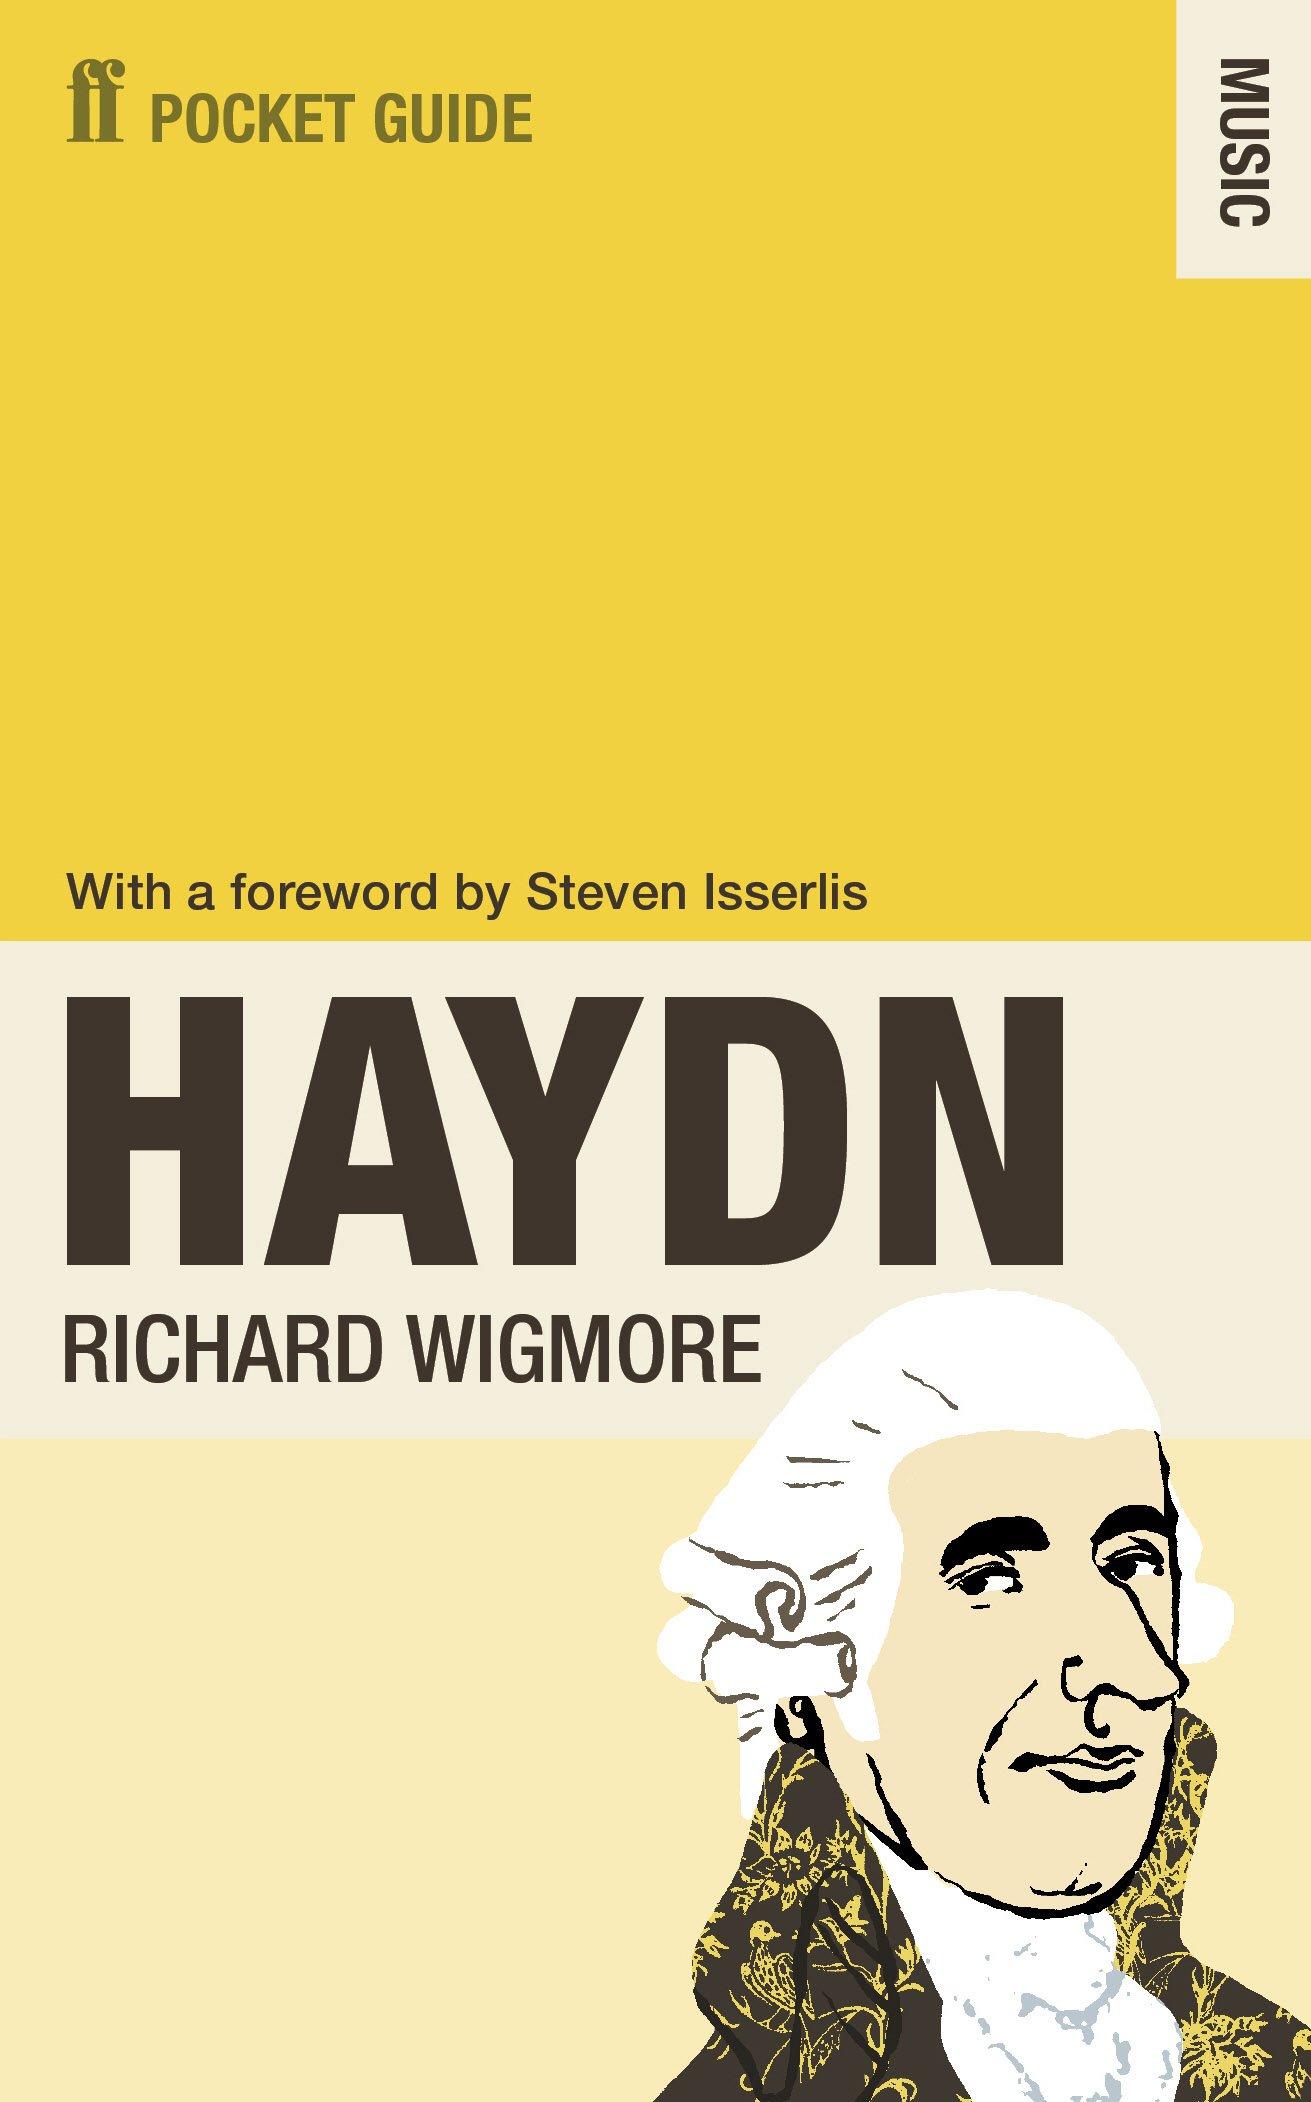 The Faber Pocket Guide to Handel (Pocket Guide - Music)